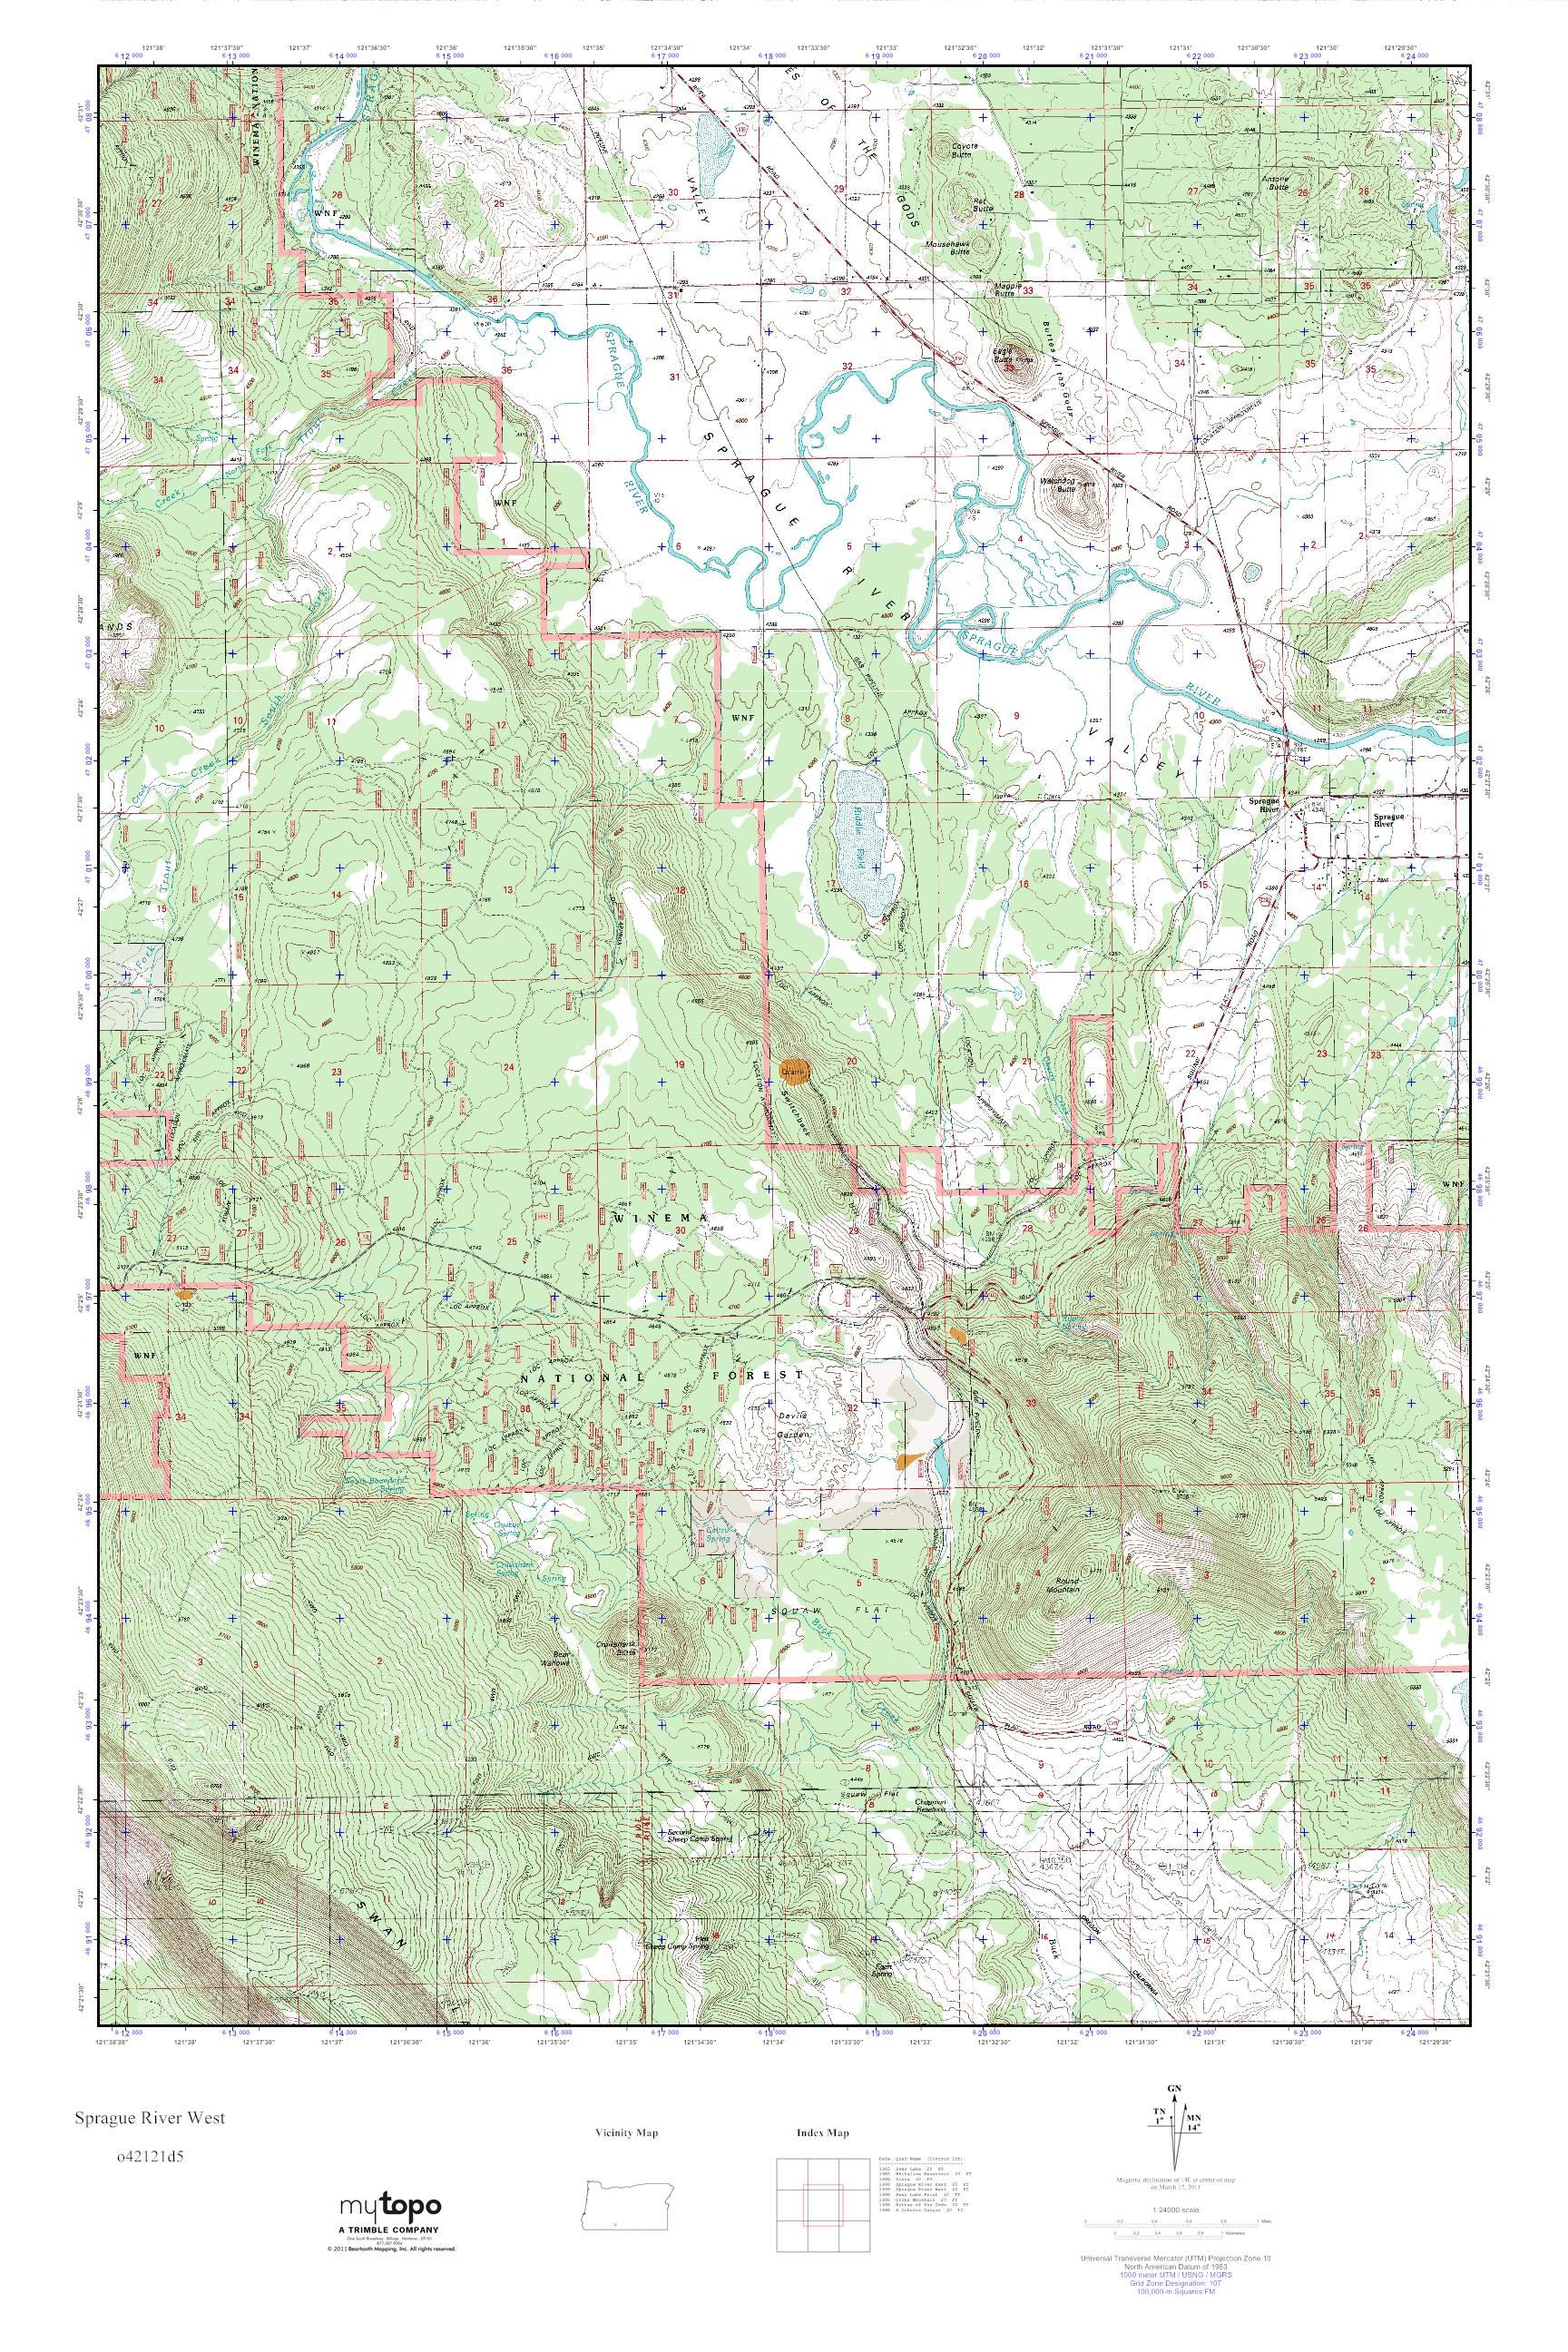 Mytopo Sprague River West Oregon Usgs Quad Topo Map